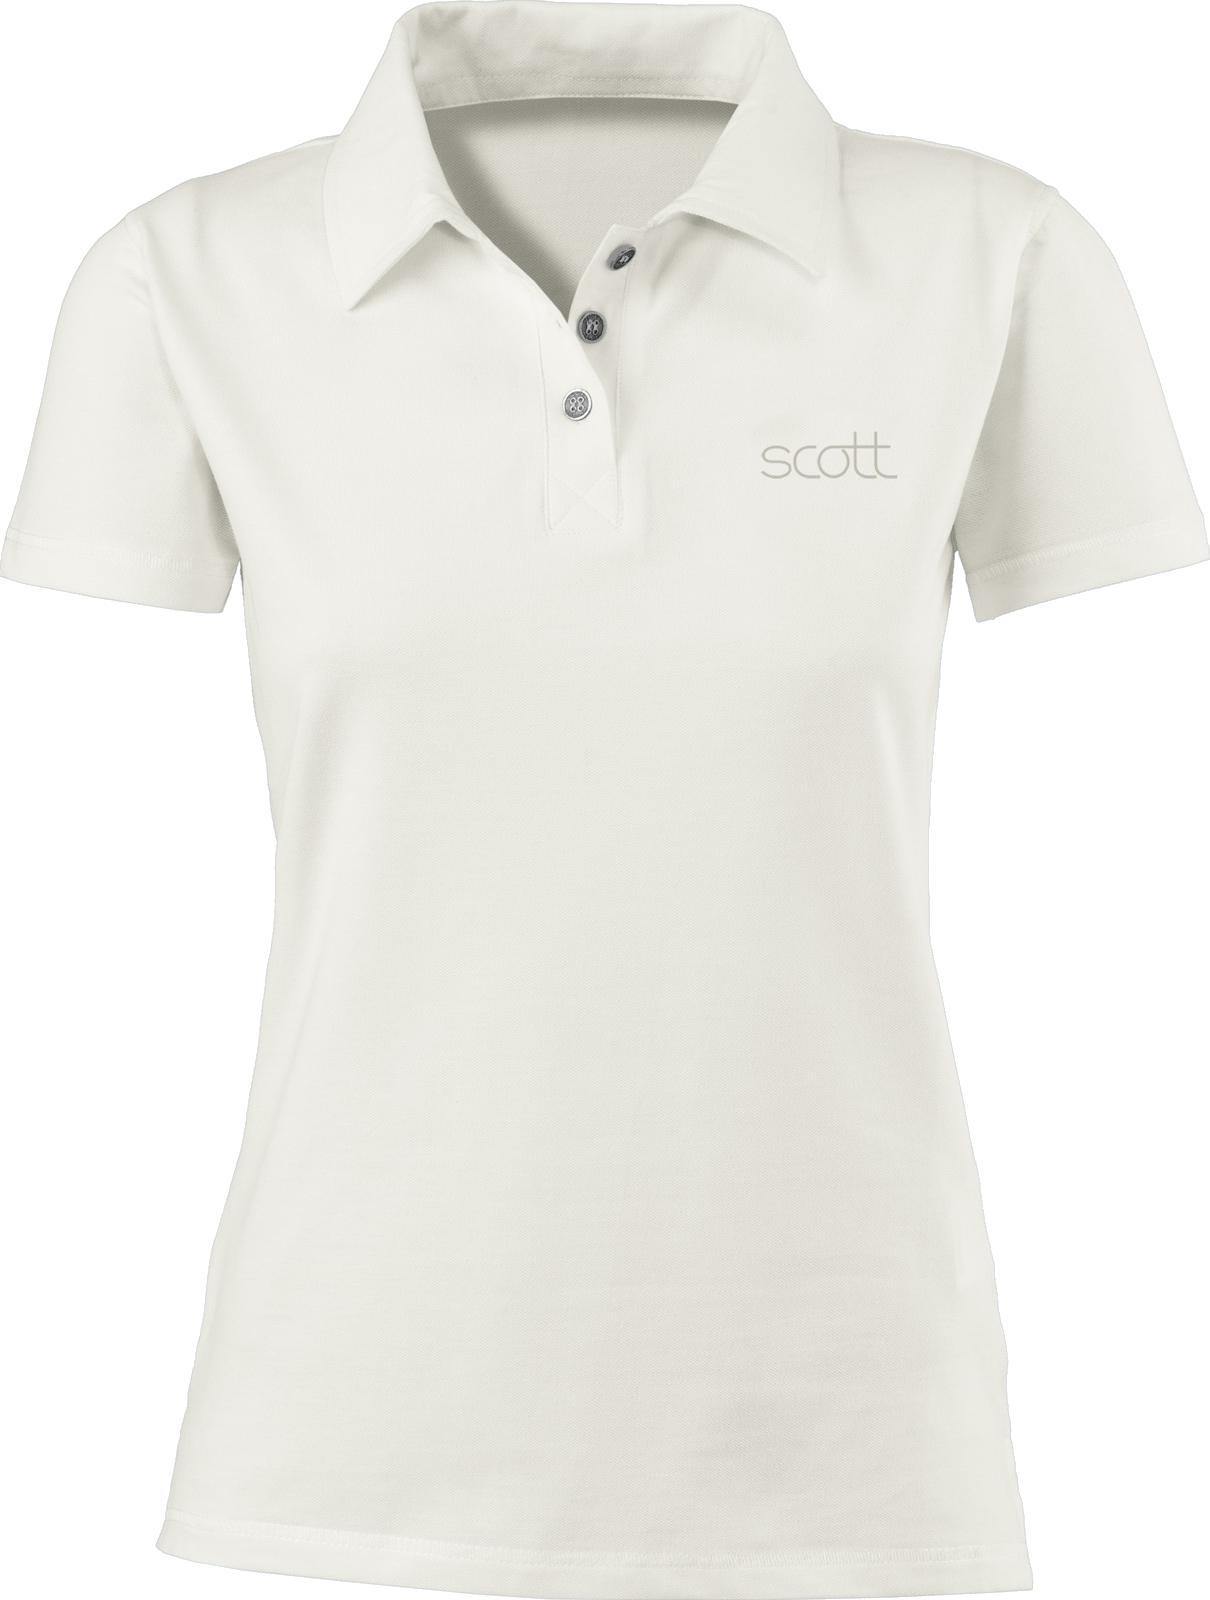 White Polo Shirt PNG Image - PurePNG | Free transparent ...